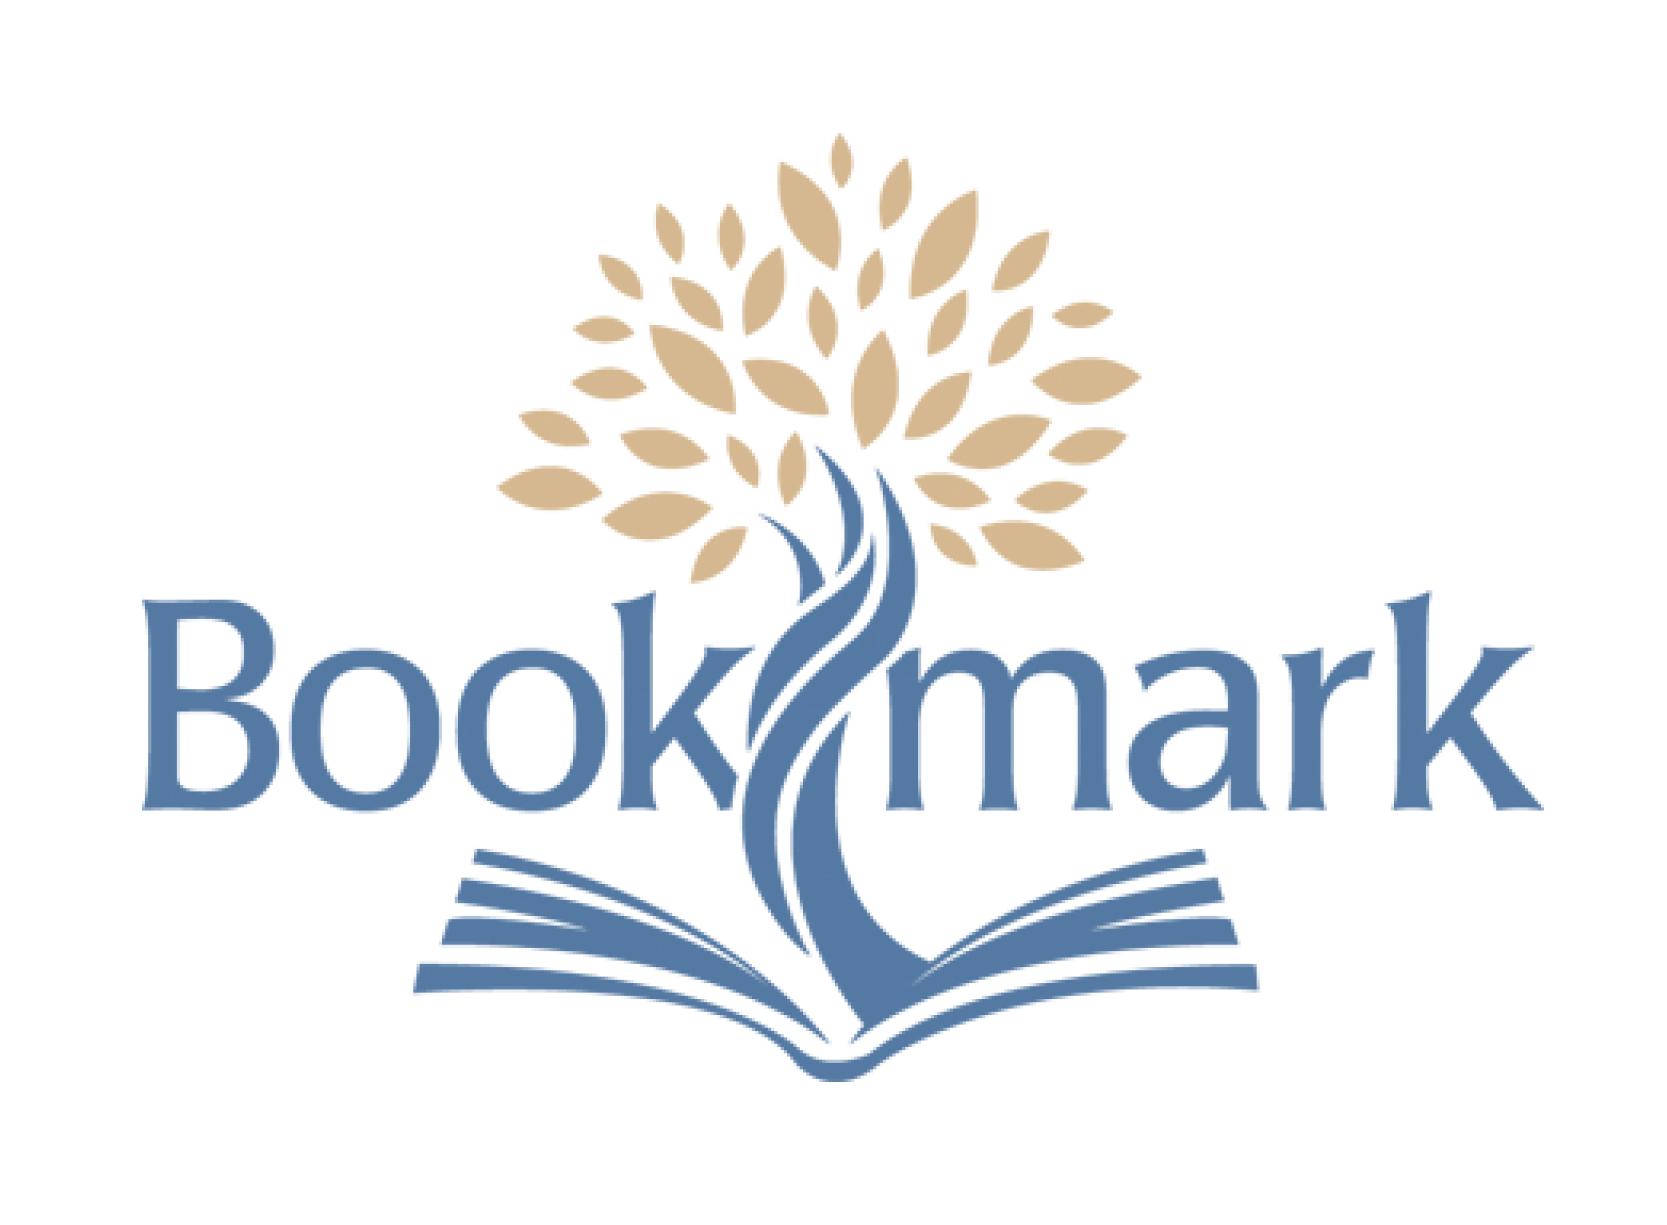 Bookmark Reads bookstore logo